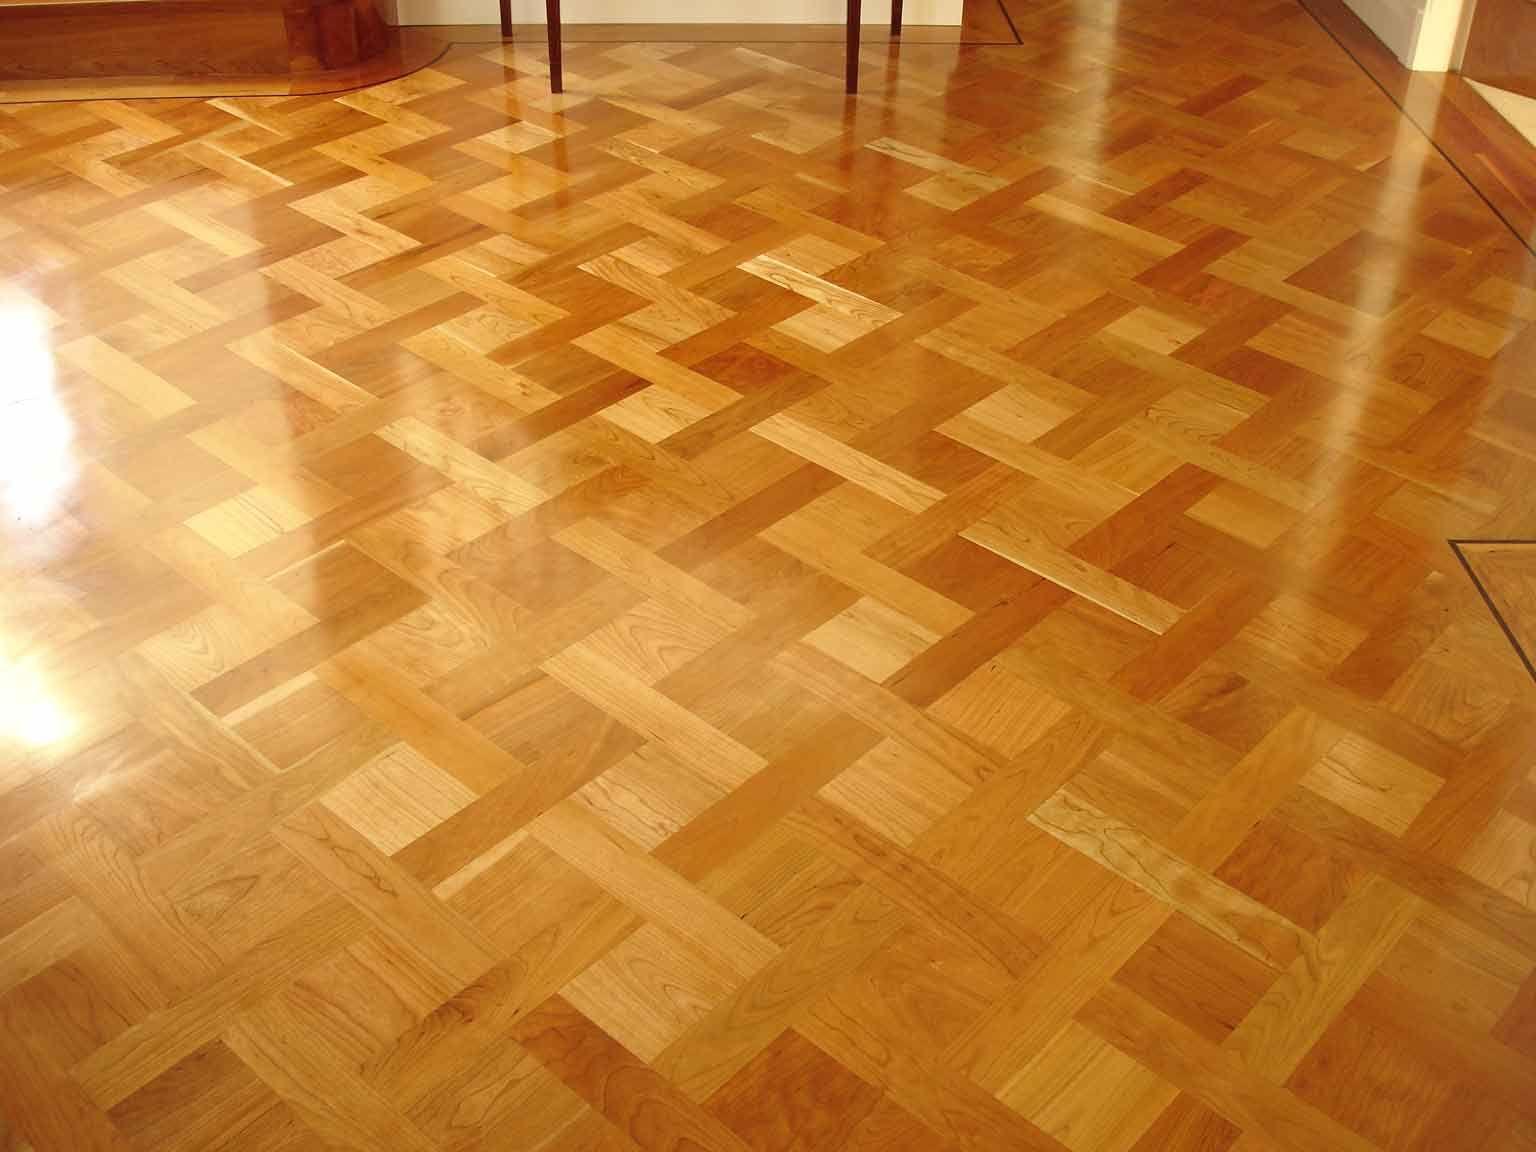 Genial Parquet Wood Flooring   Clear Hardwood Parquet Flooring